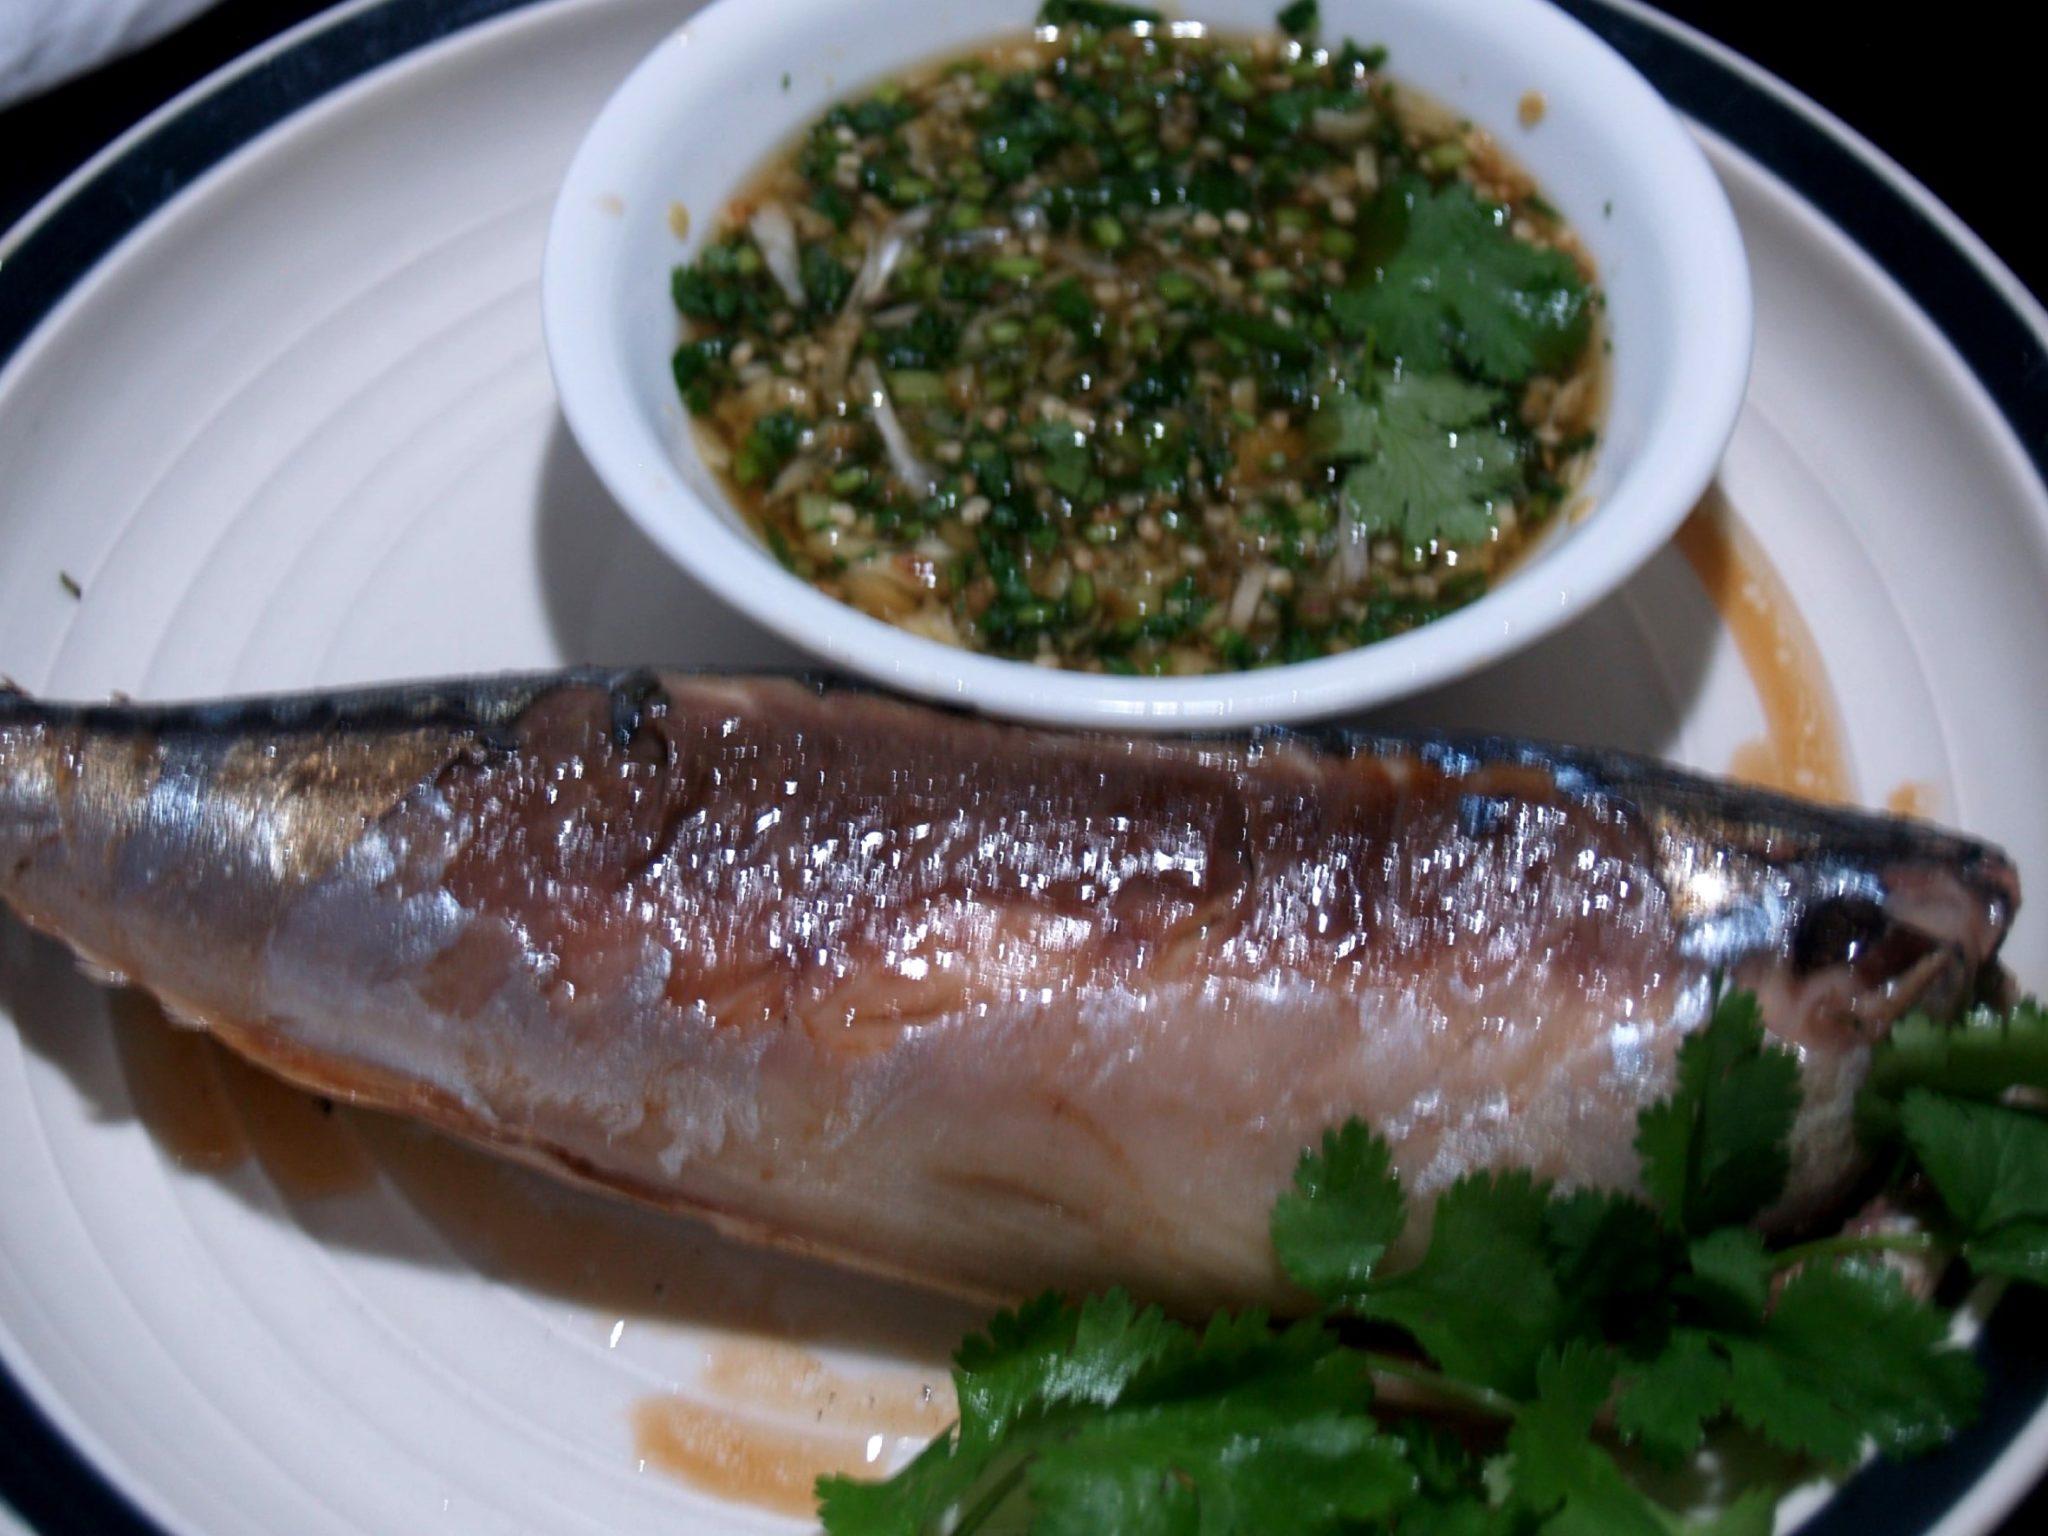 how to cook mackerel fillets in foil